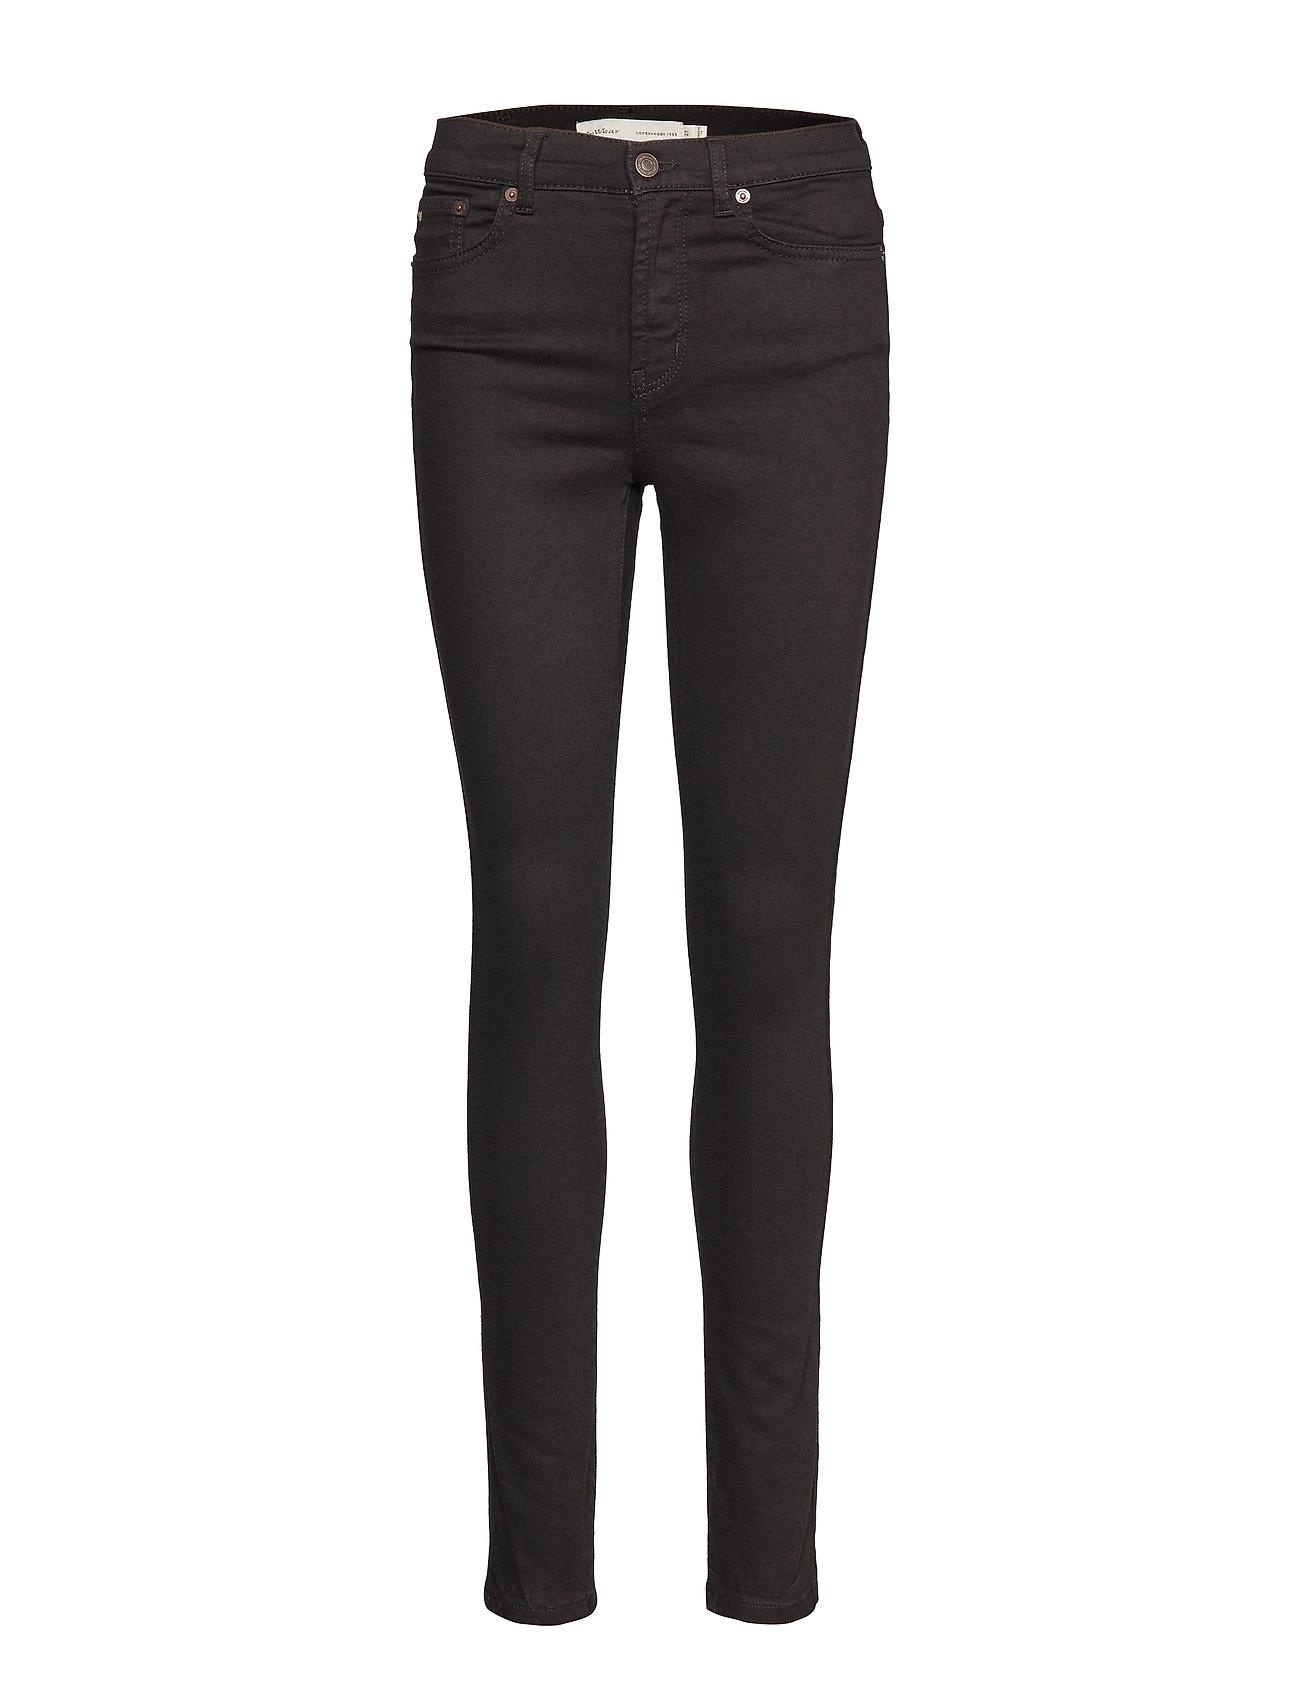 InWear Eliza Skinny Jeans - BLACK